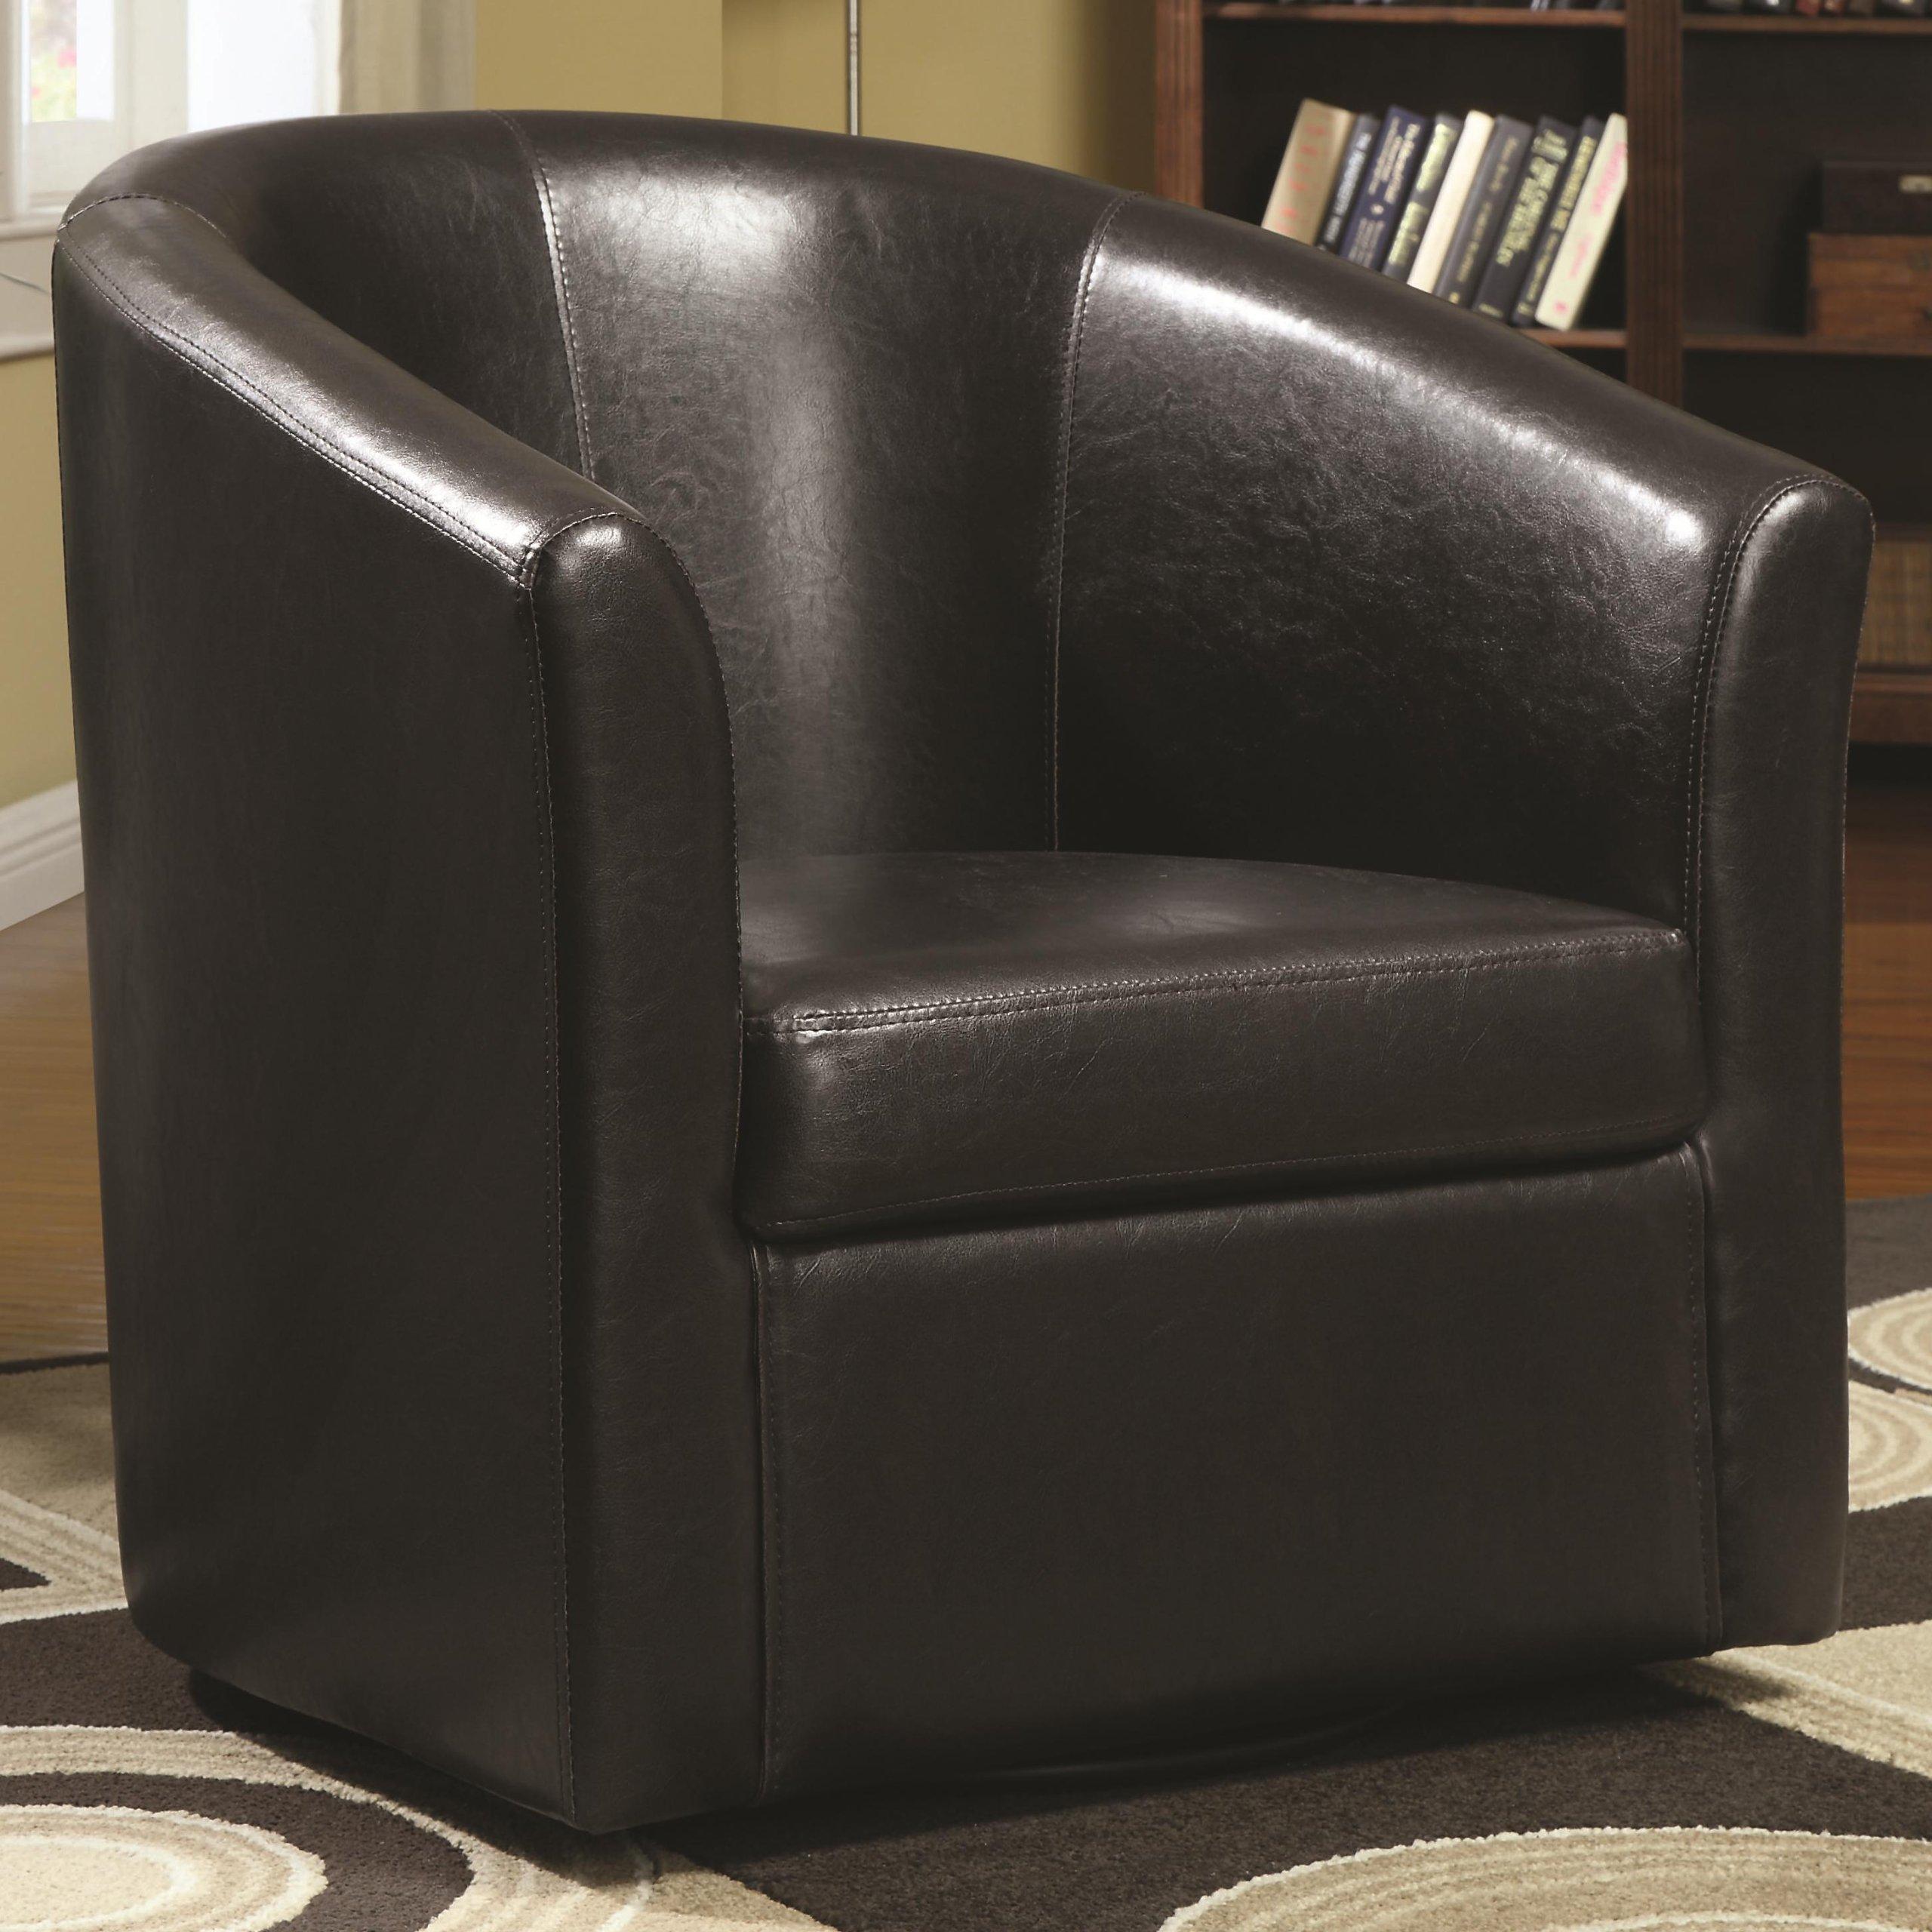 Coaster Home Furnishings  Modern Transitional Barrel Back Tub Club Arm Swivel Accent Chair - Dark Brown Faux Leather